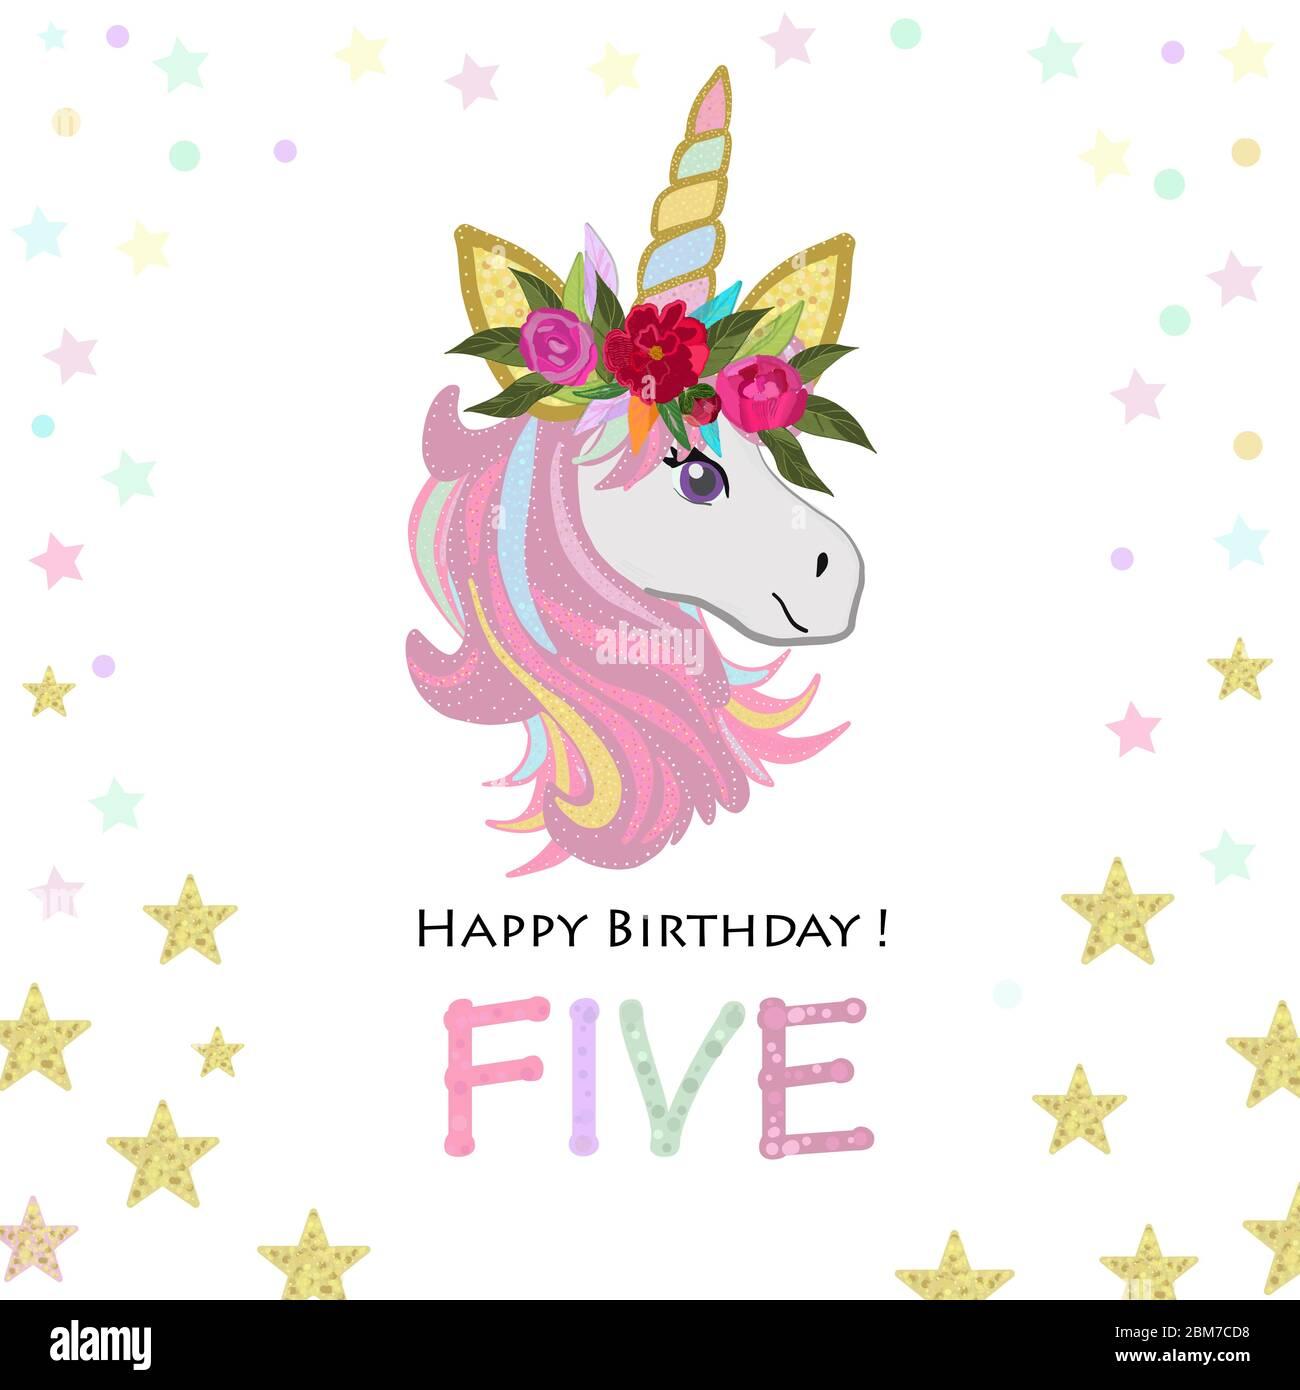 https www alamy com fifth birthday greeting five text magical unicorn birthday invitation party invitation greeting card image356663924 html